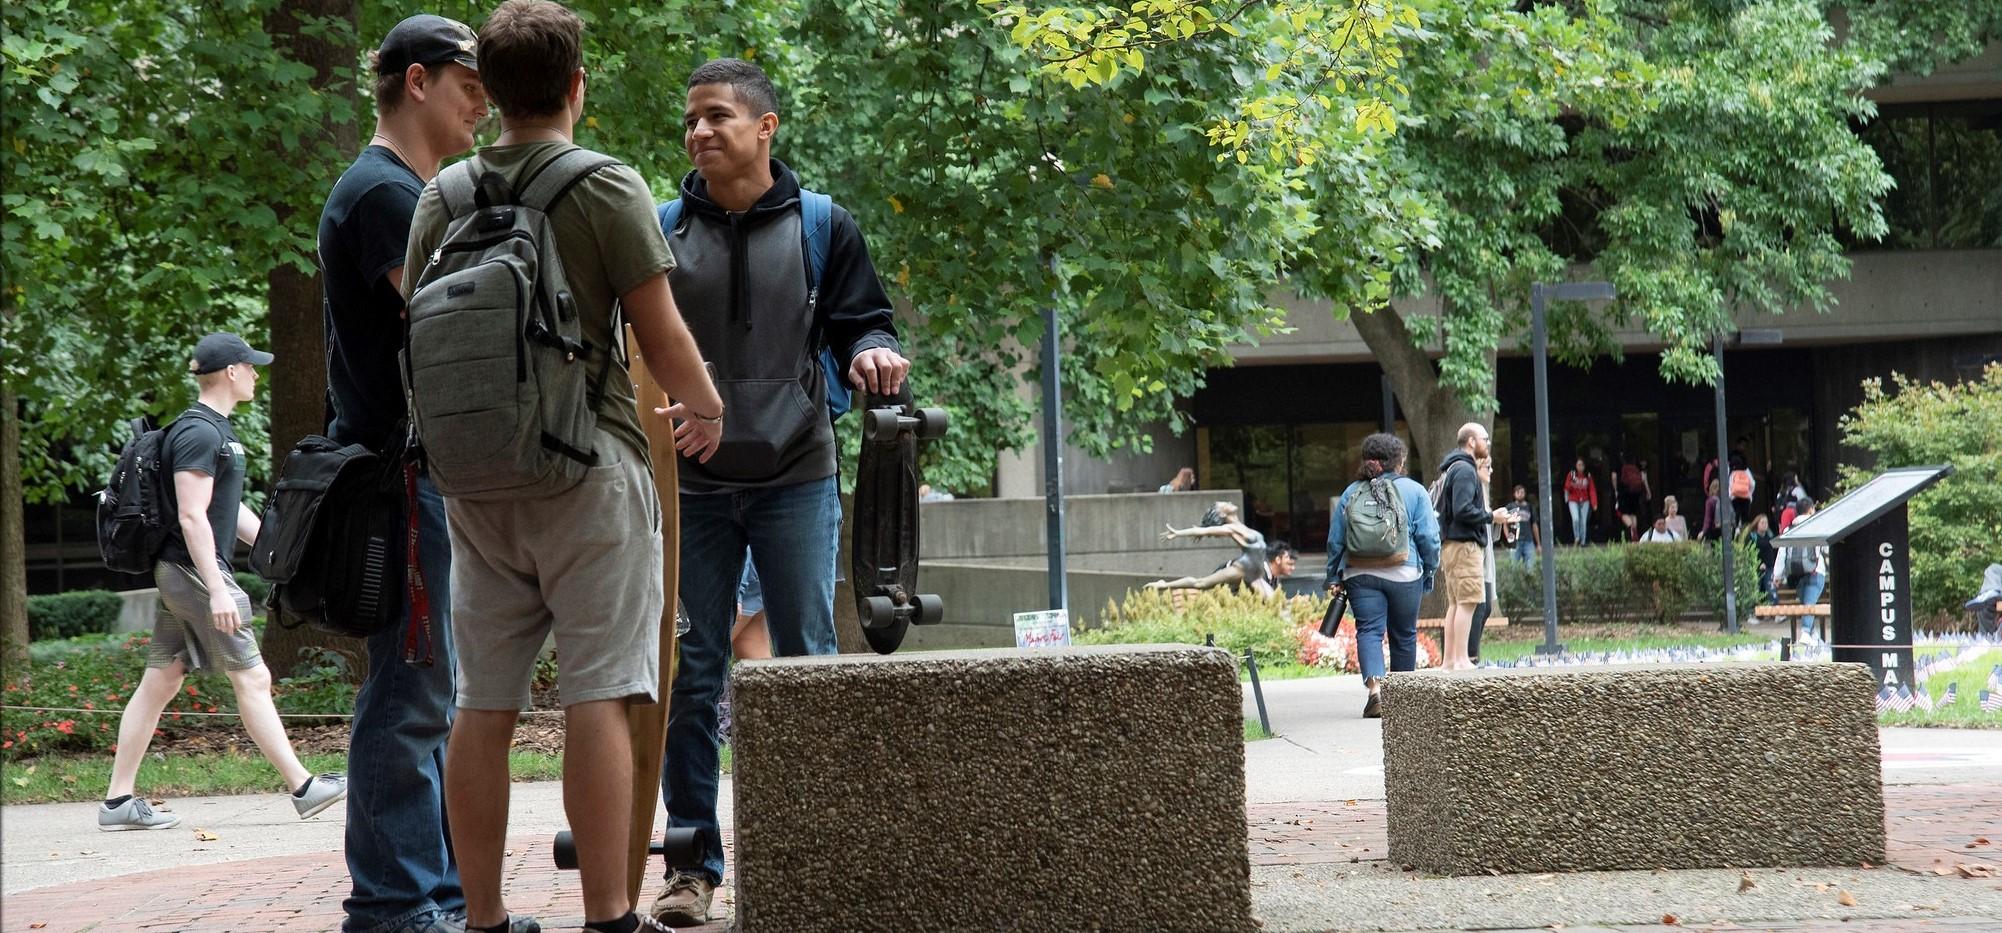 Students talking in Quad